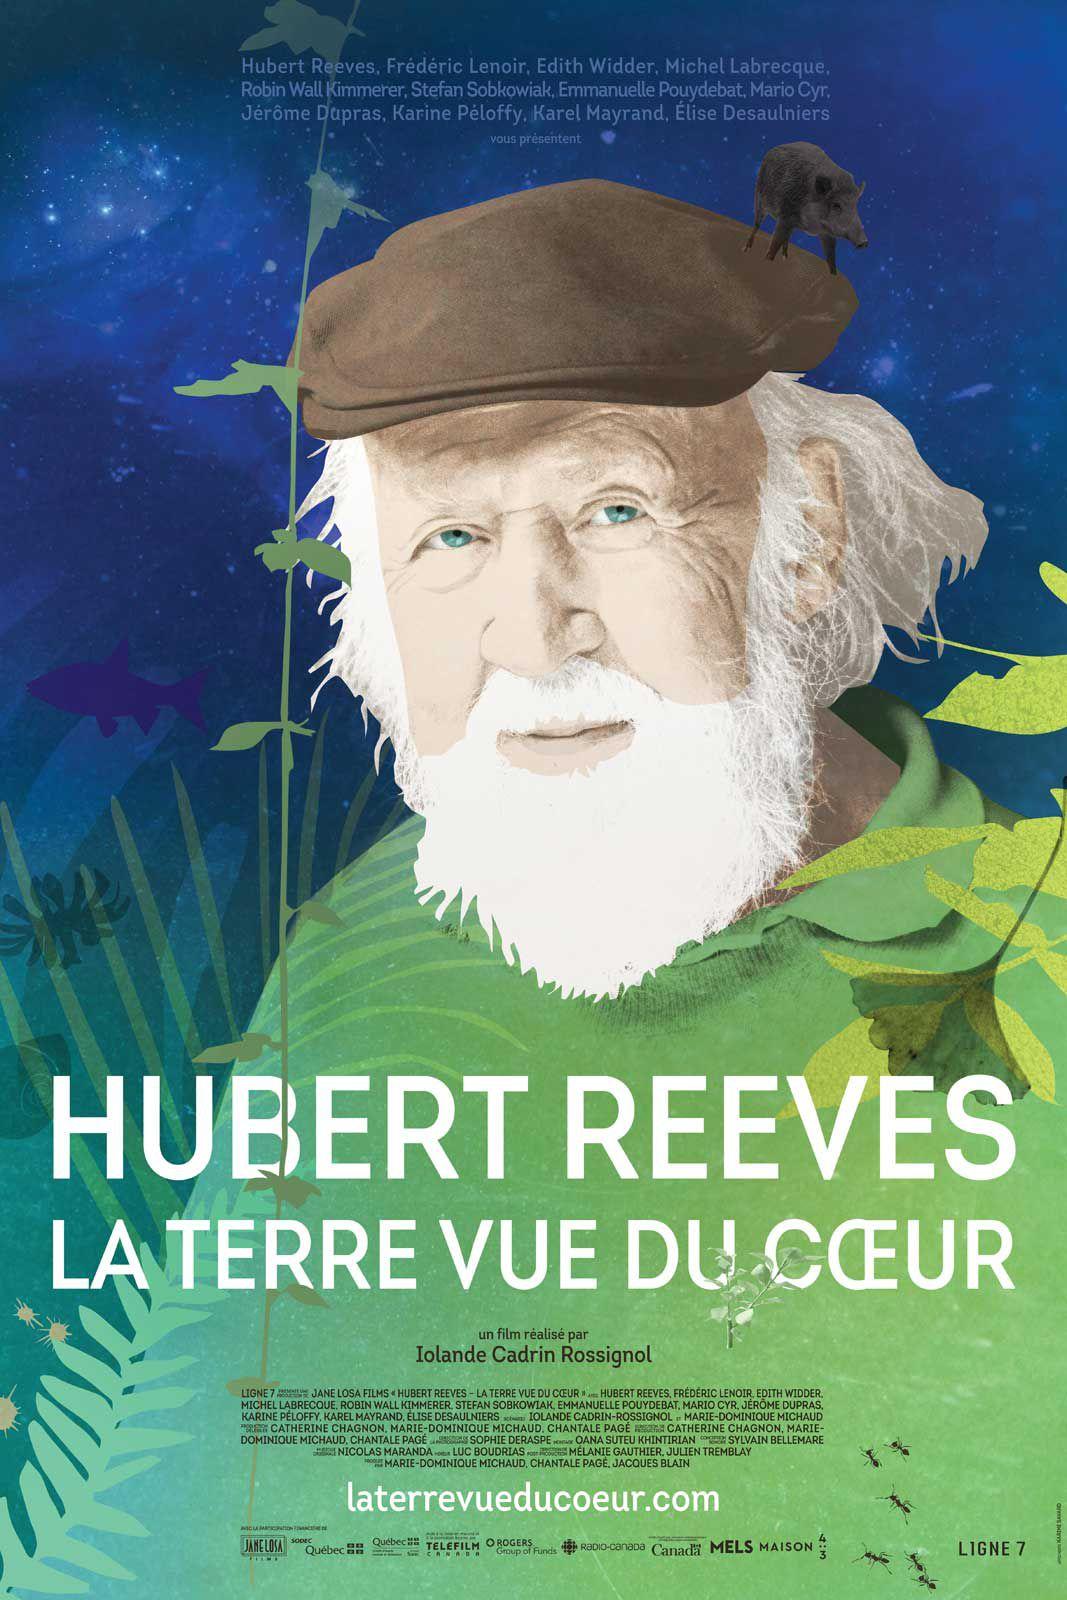 Hubert Reeves - La Terre vue du coeur - Documentaire (2018)